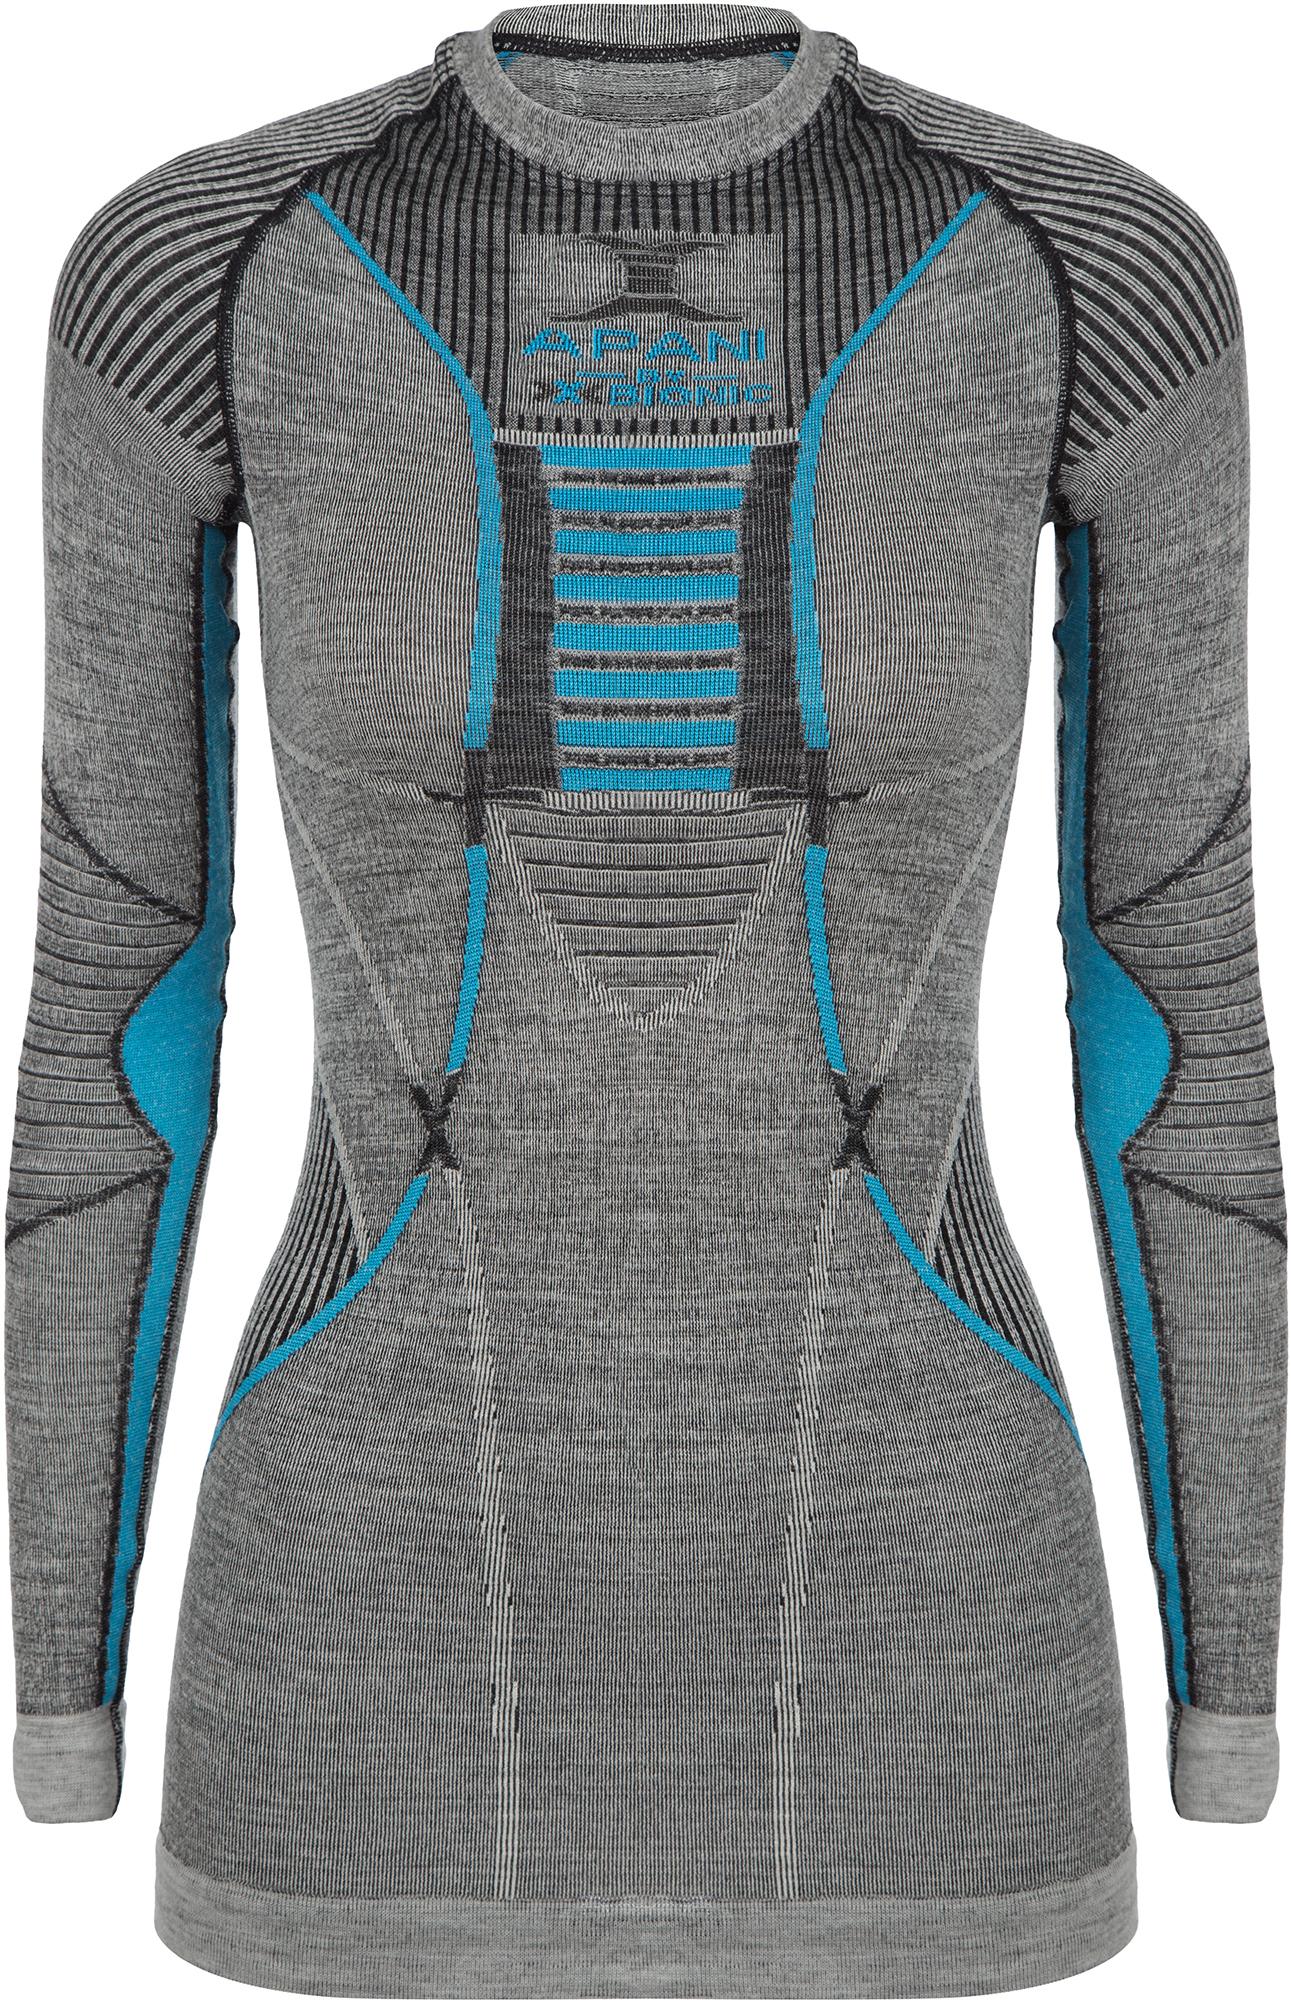 Фото - X-Bionic Термобелье верх женское X-Bionic Apani 4.0 Merino, размер 46 dormeo merino